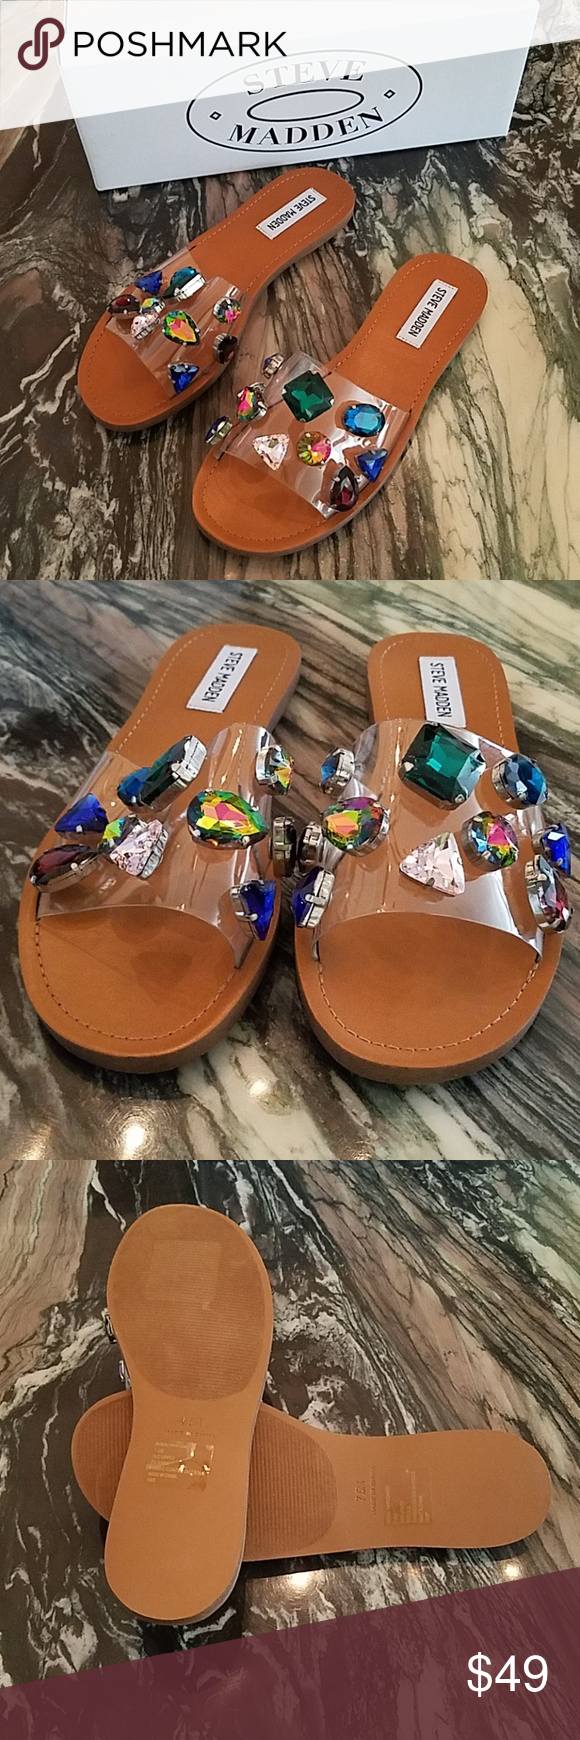 541b9a9cb30 Steve Madden Rosalyn Clear Jeweled Sandals Super fun and Stylish ...